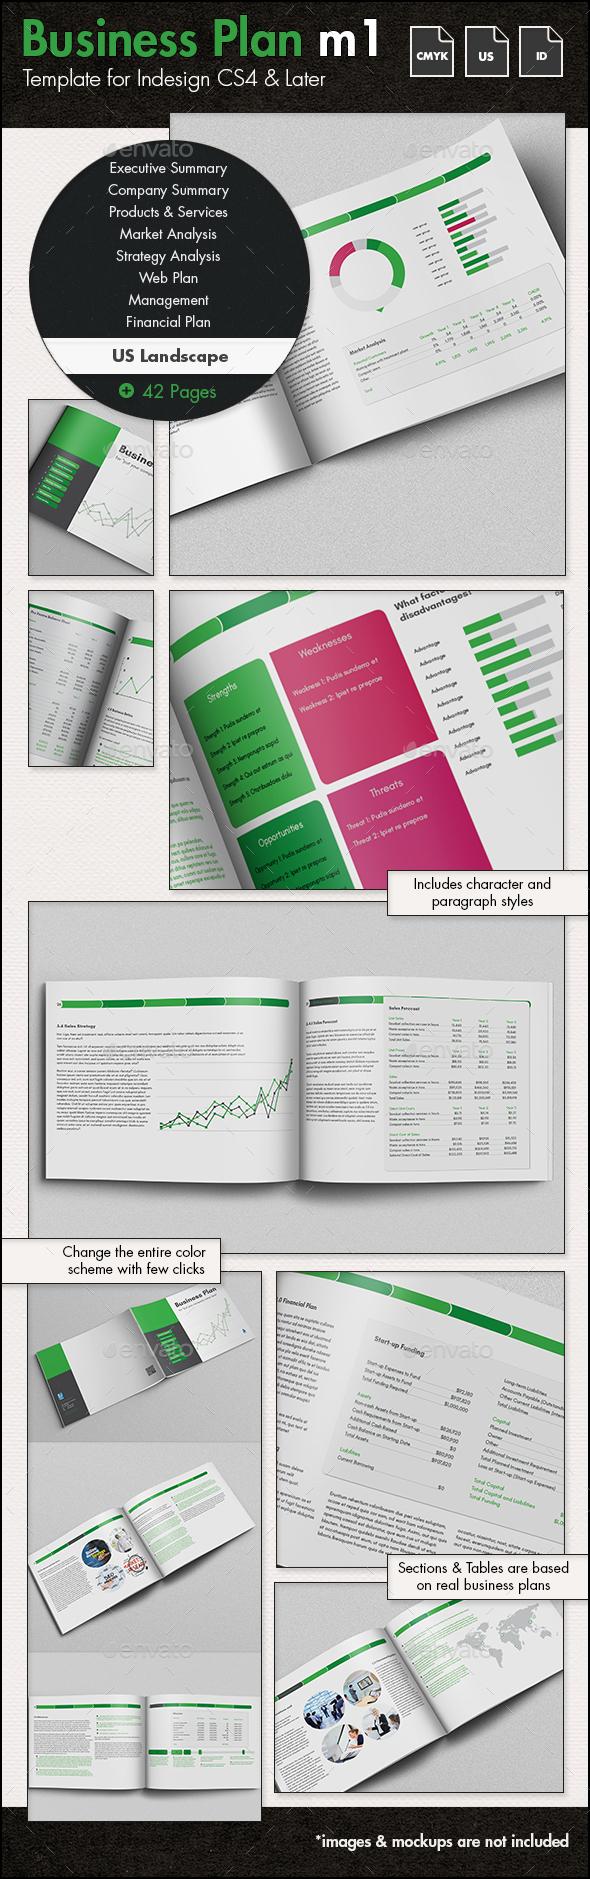 Business Plan Template m1 - US Letter Landscape - Proposals & Invoices Stationery